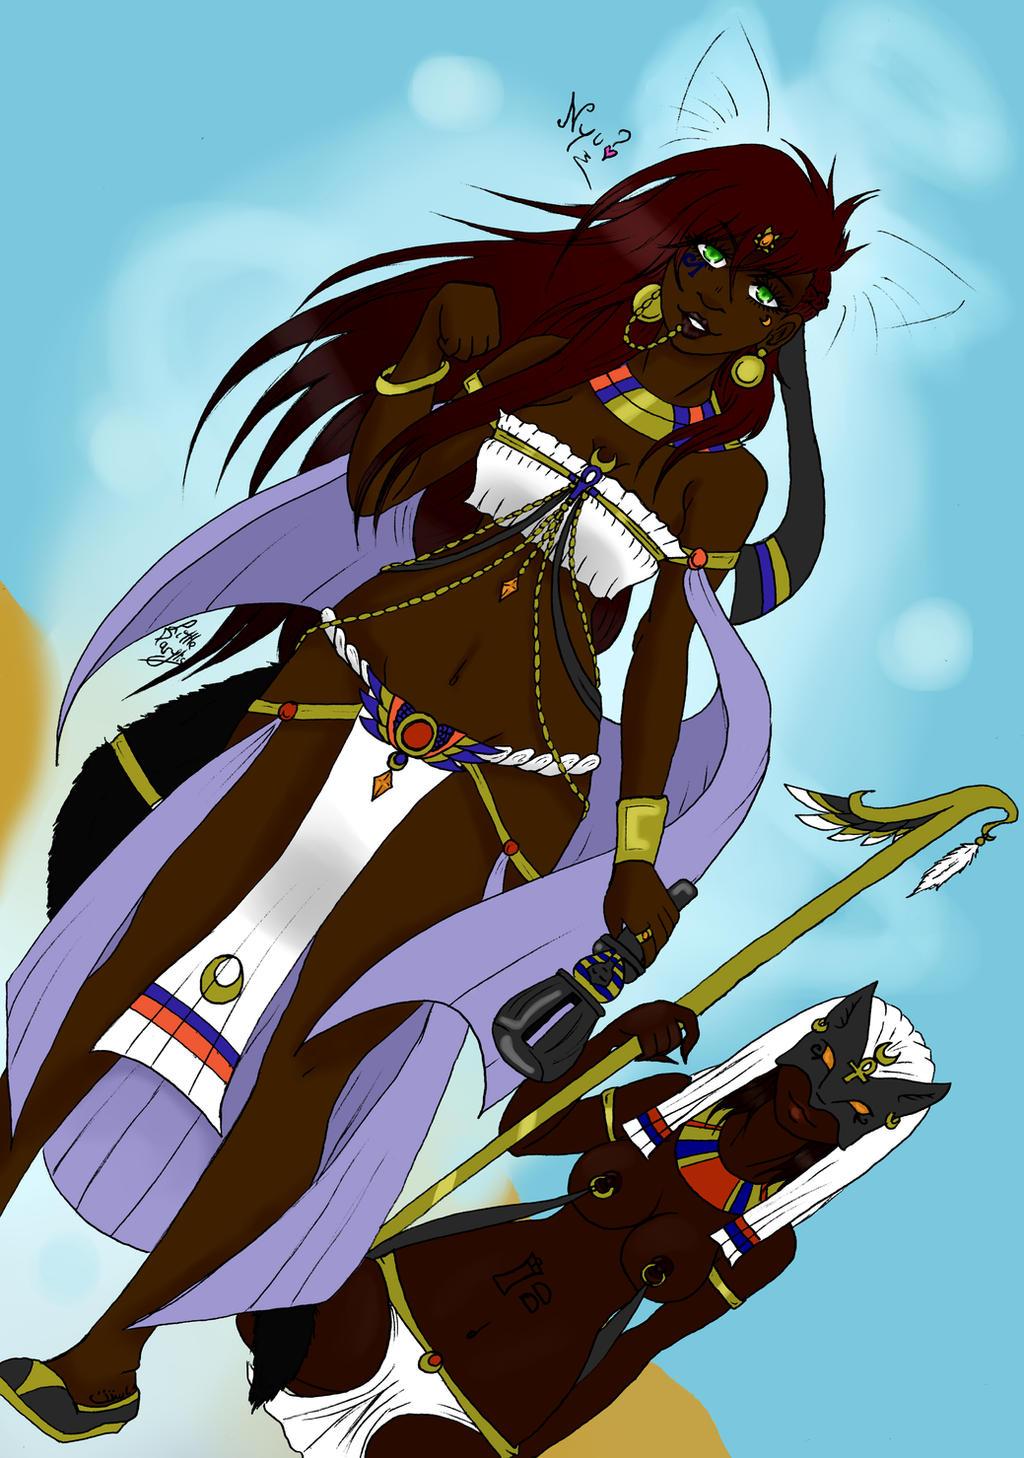 Bastet - Egyptian Goddess (KnA's fangame OD) by ALittleLady